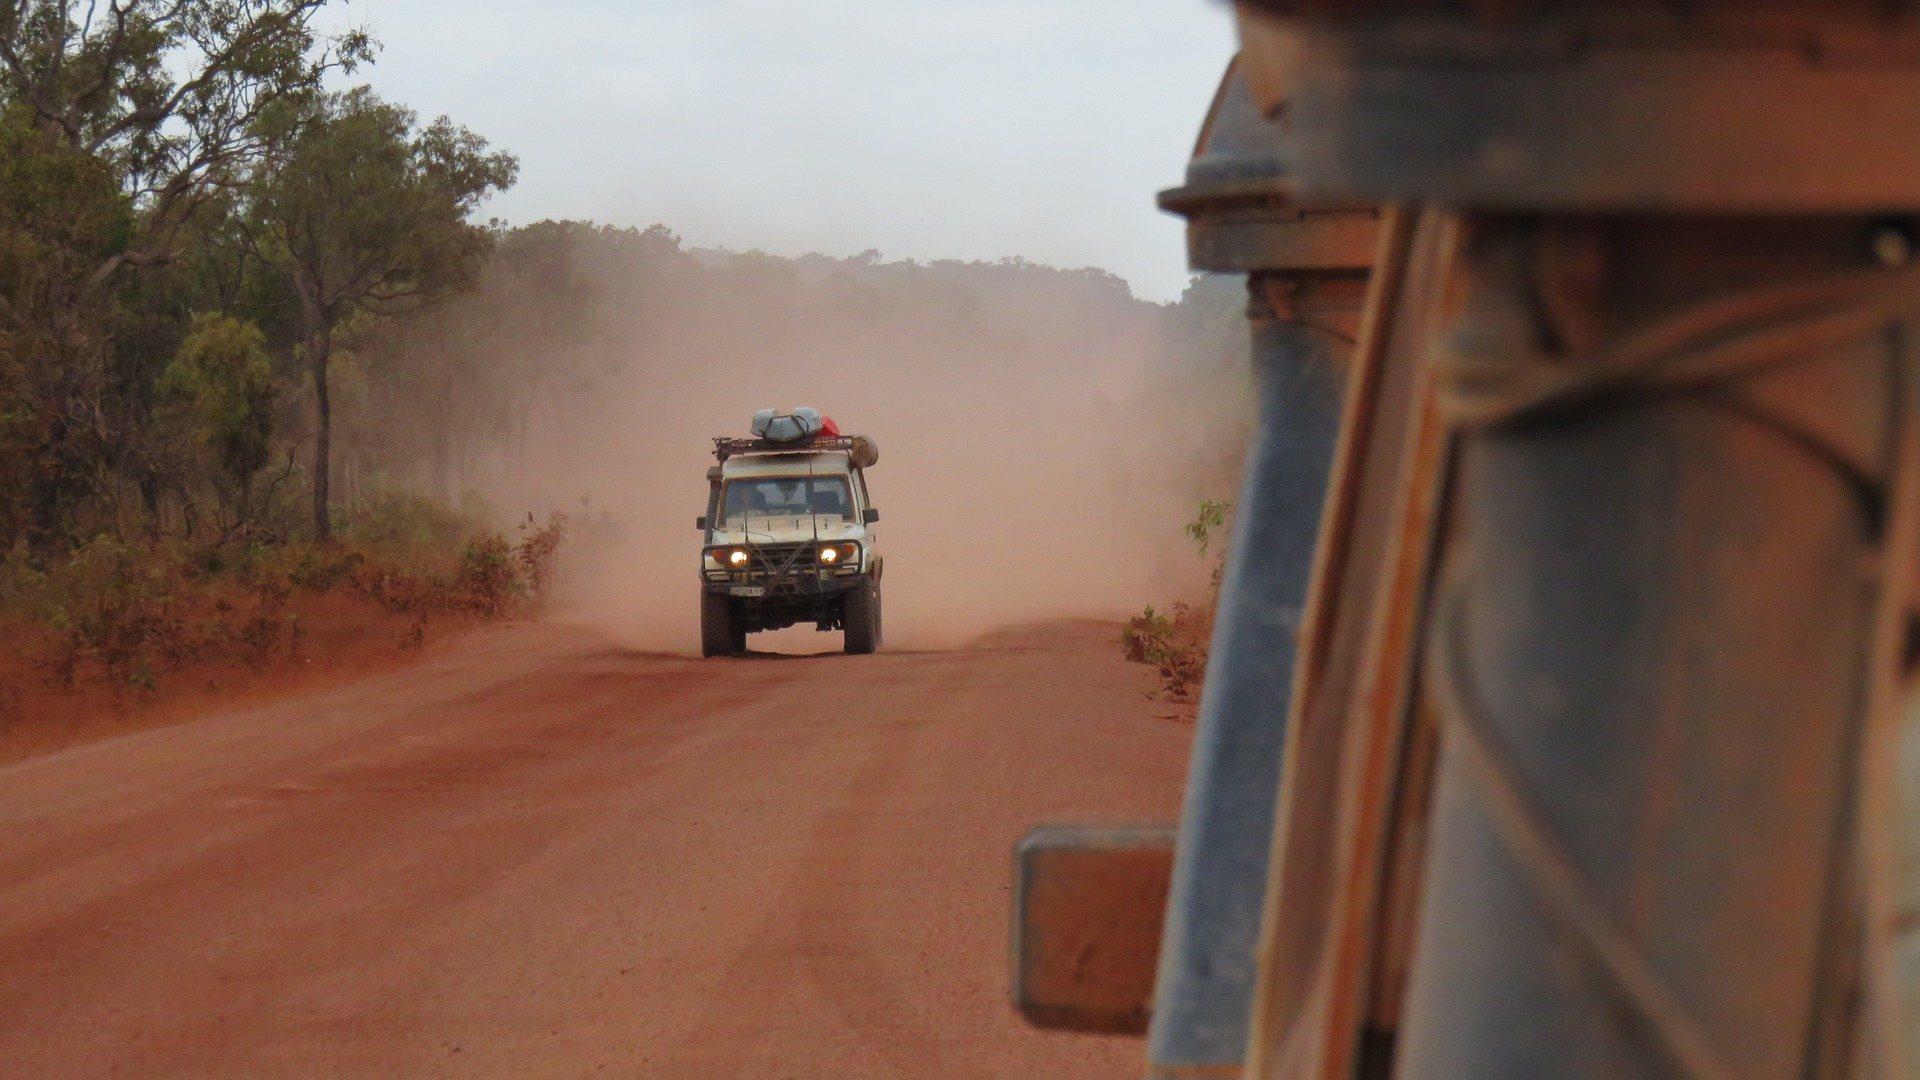 Australian Off Road 4x4 adventure